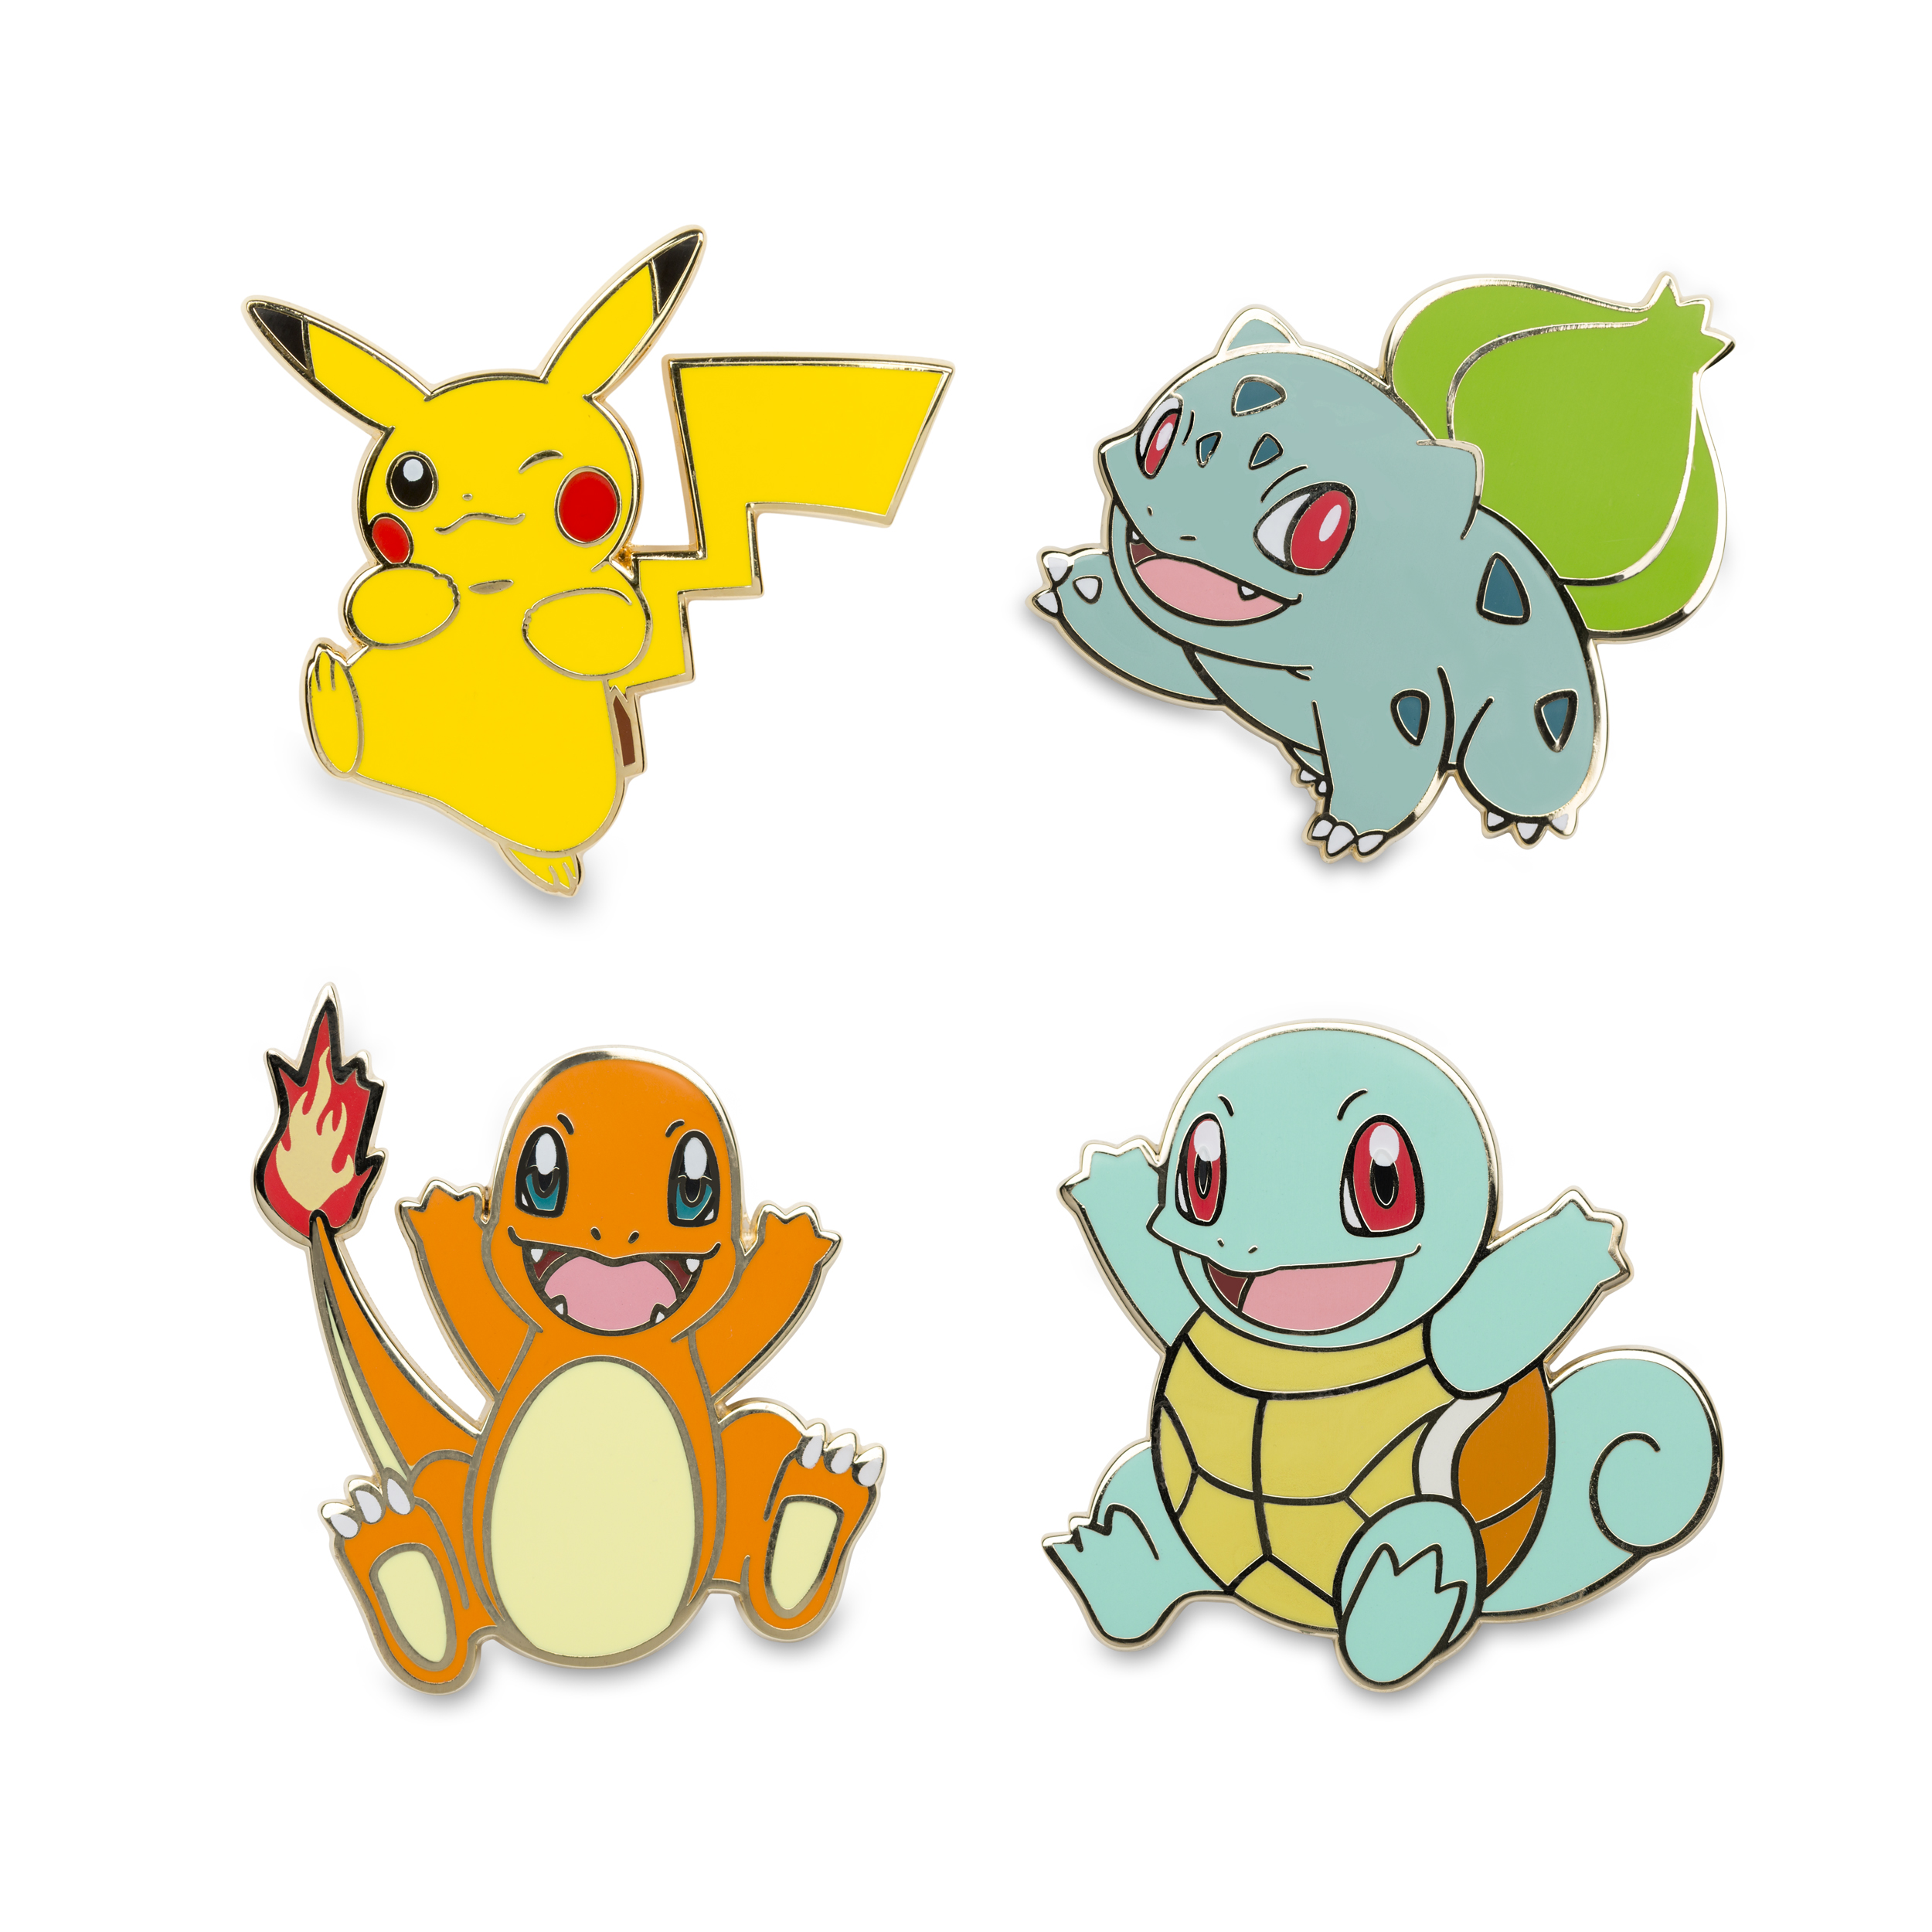 Pikachu clipart charmander Pokémon _5_3074457345618259663_3074457345618262055_3074457345618268804 (4 Image Bulbasaur